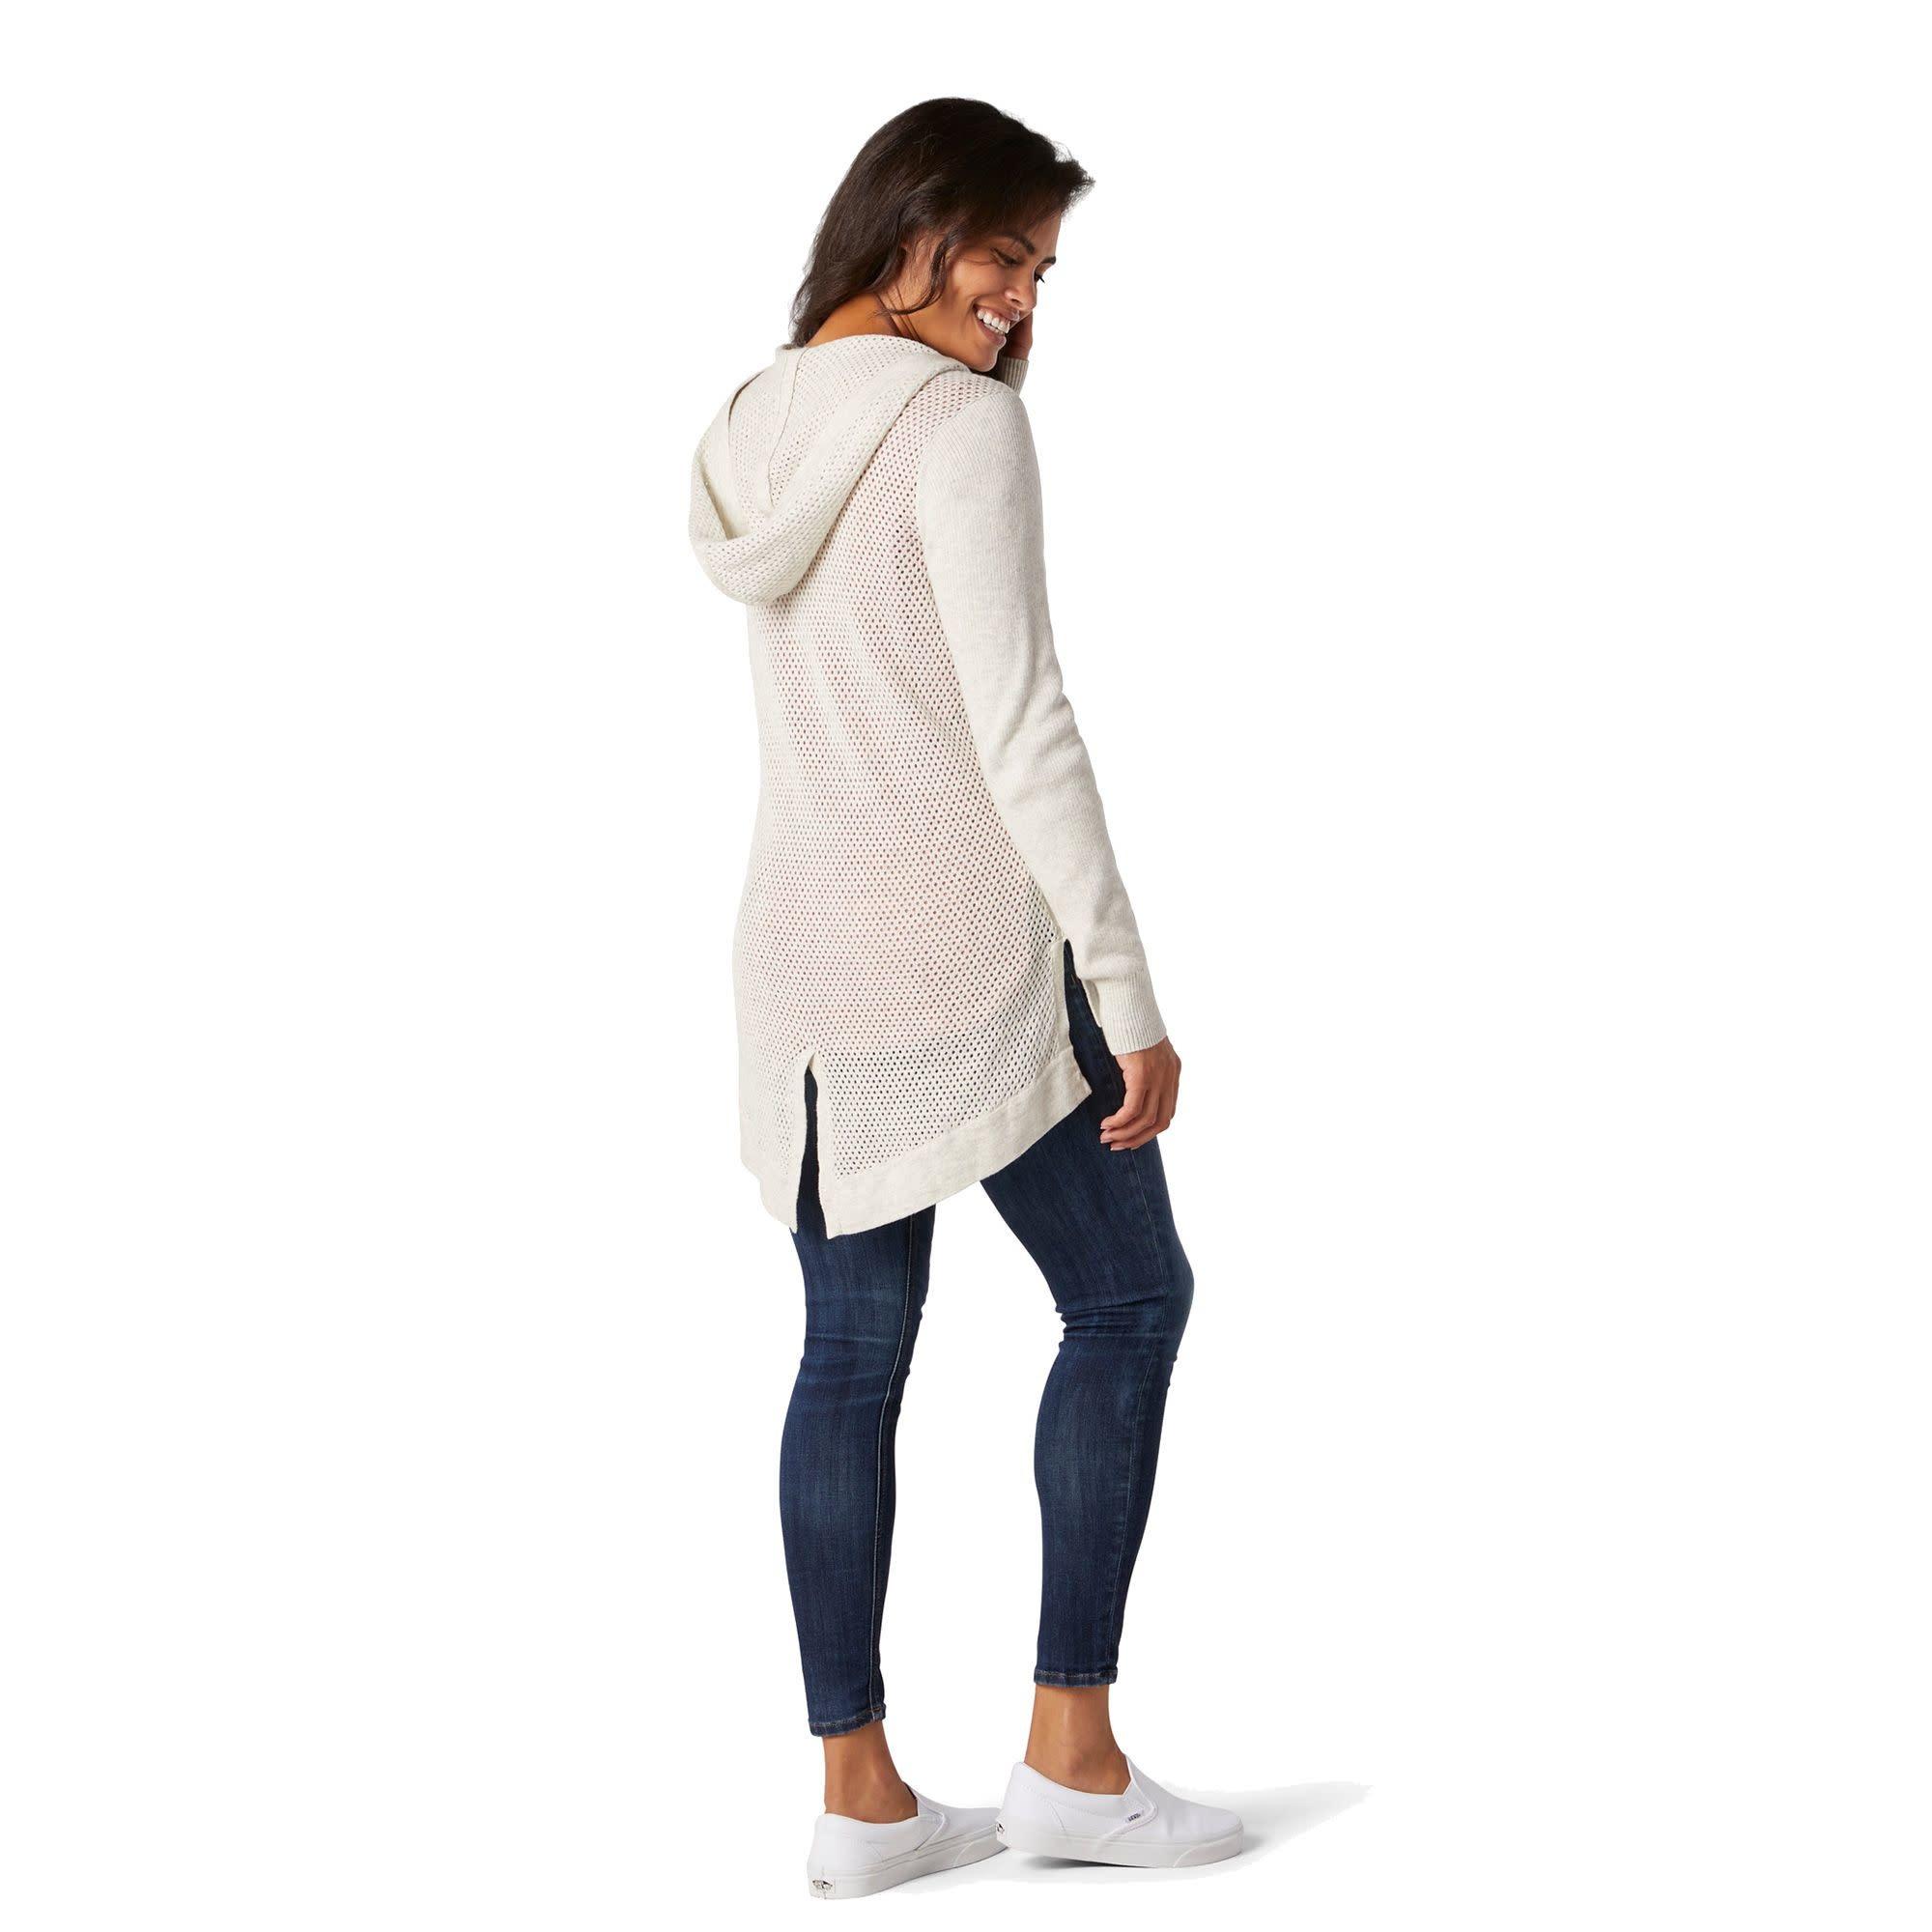 Smartwool Everyday Exploration Sweater Jacket - Ash